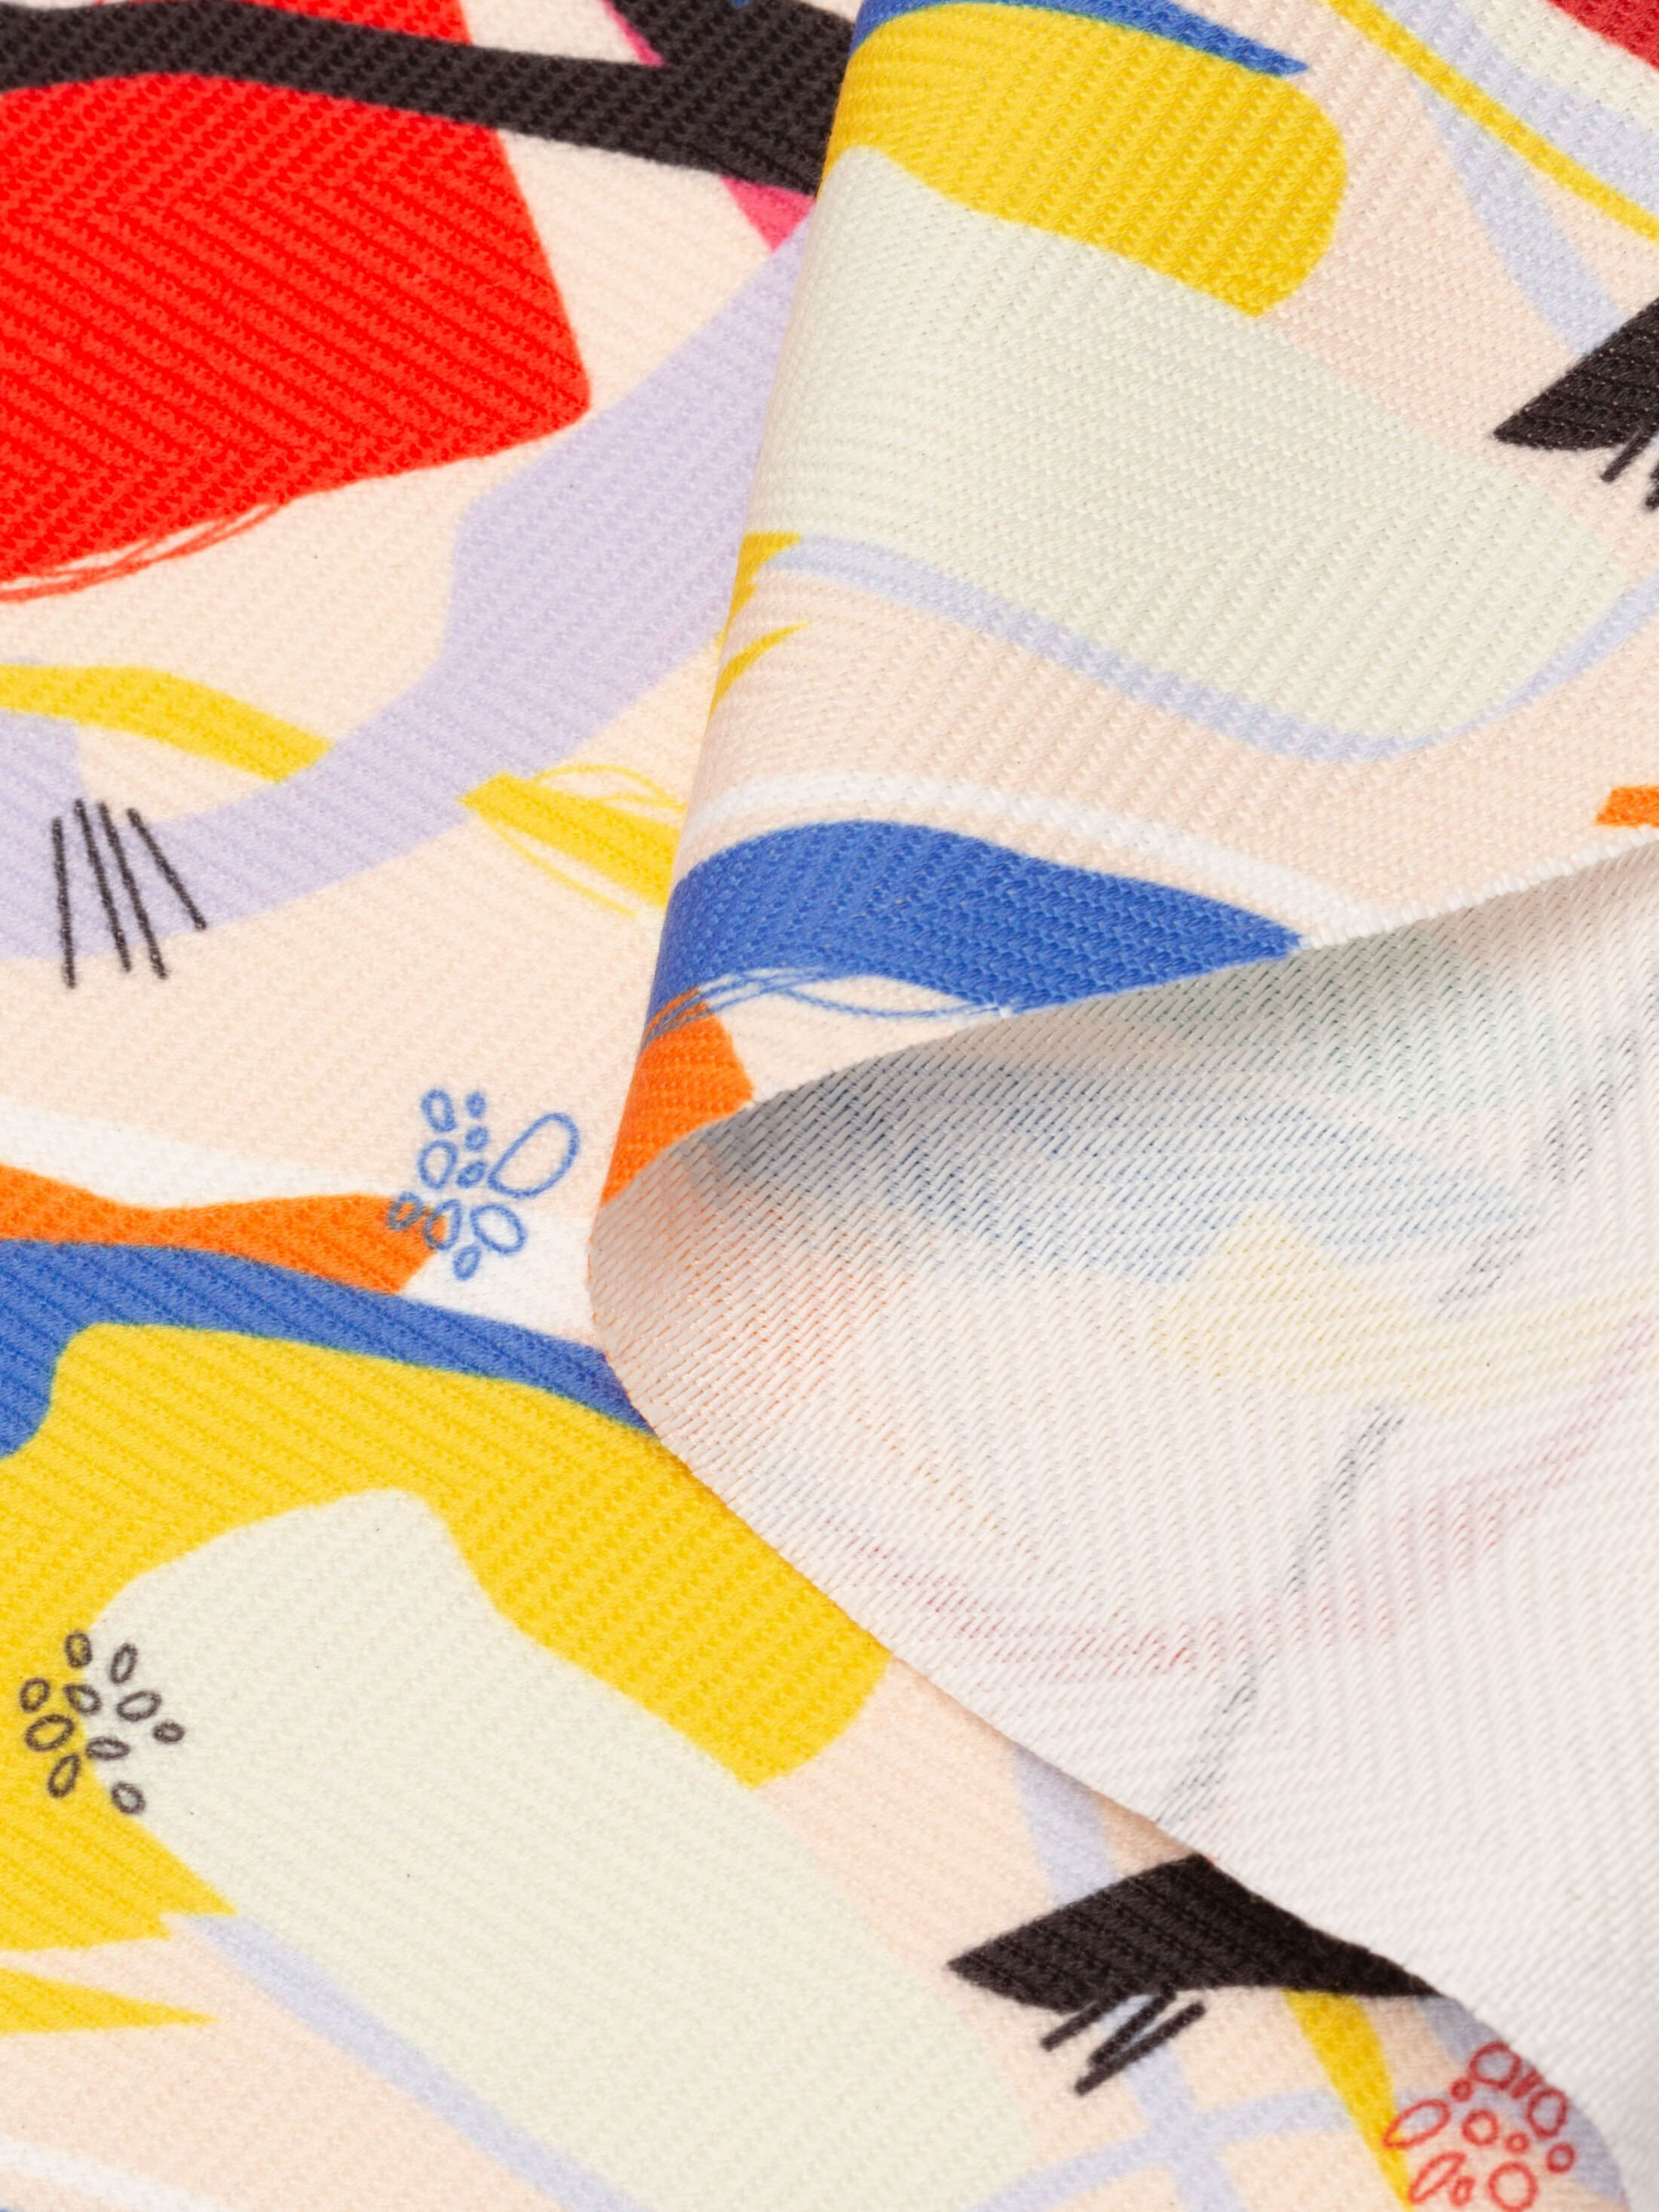 Mayfair fabric printing